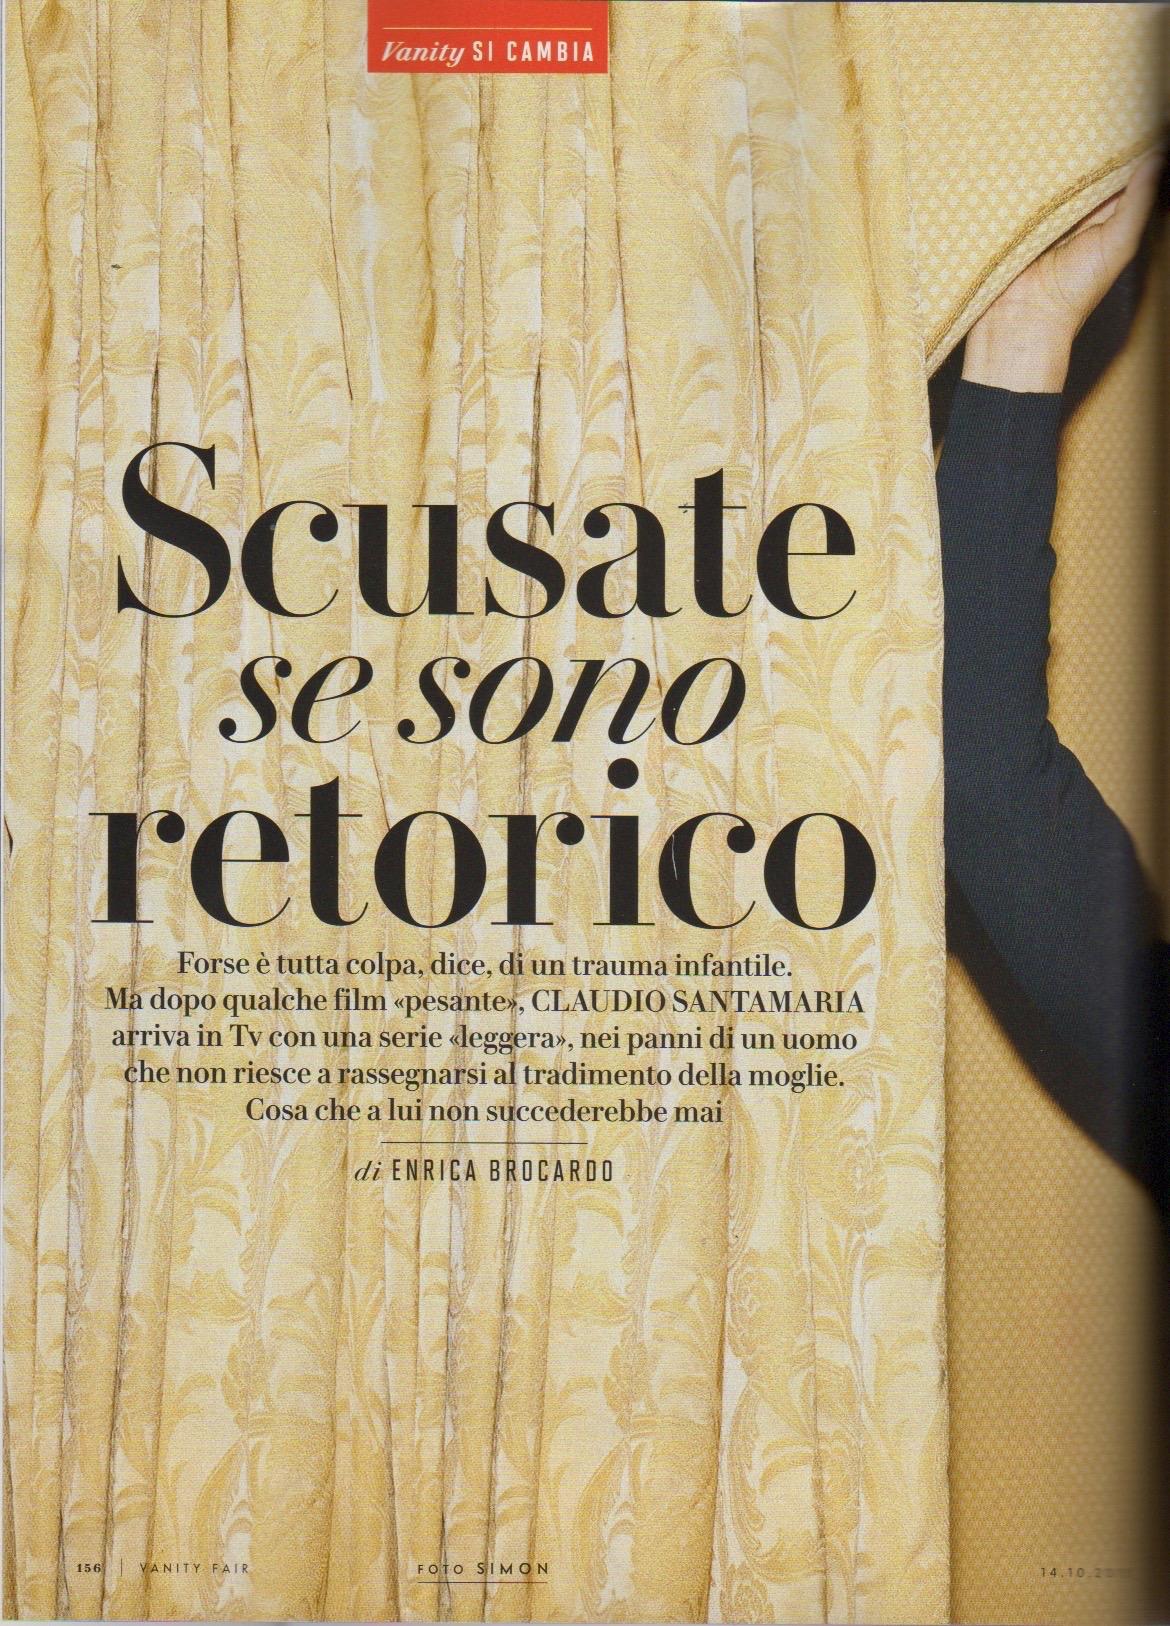 Santamaria vanity fair 14:10:2015 (1)